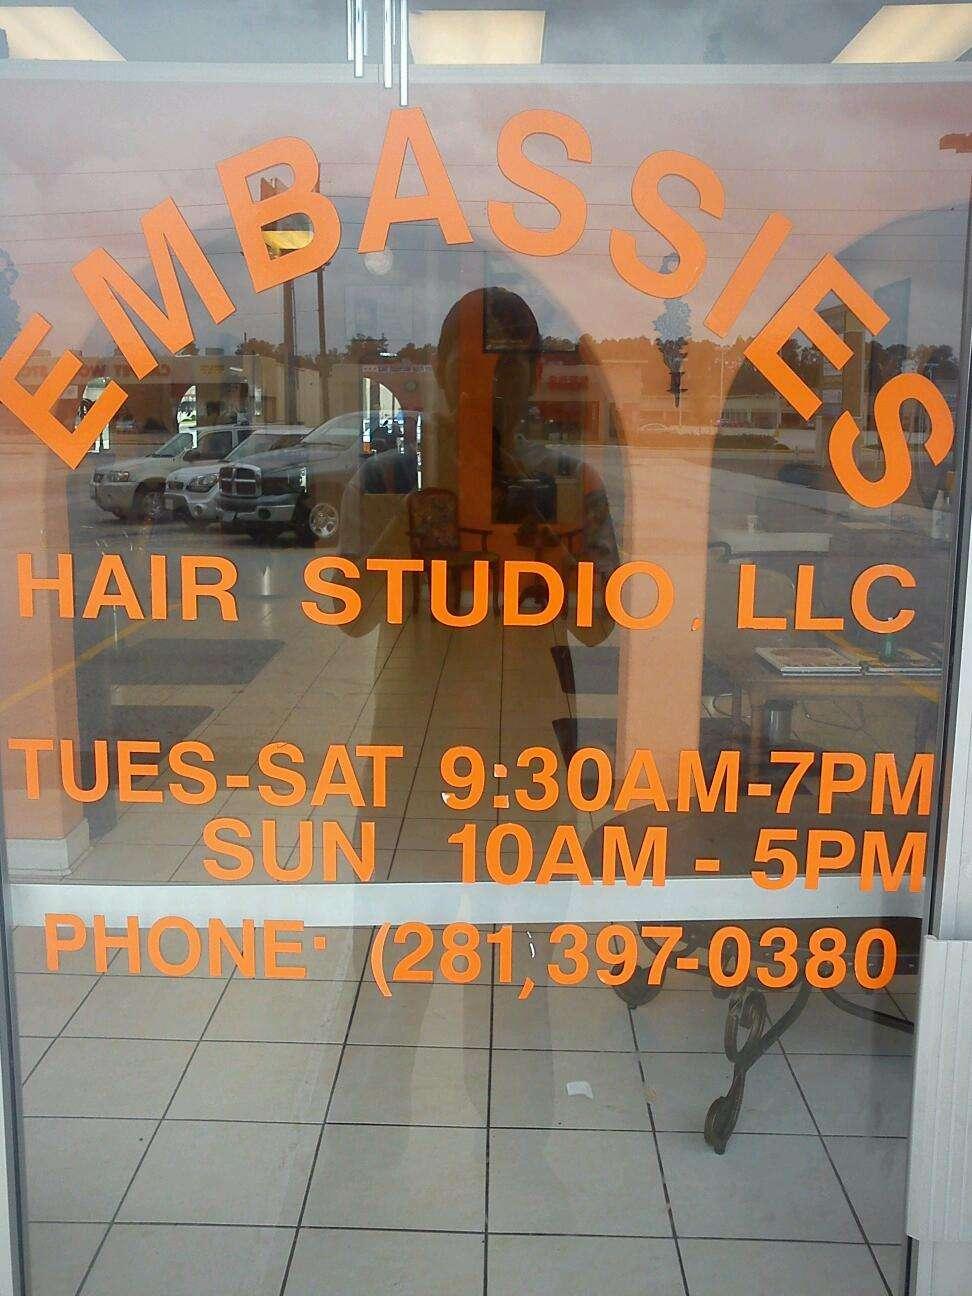 Embassies Hair Studio - hair care  | Photo 2 of 2 | Address: 2135 Cypress Creek Pkwy, Houston, TX 77090, USA | Phone: (281) 397-0380